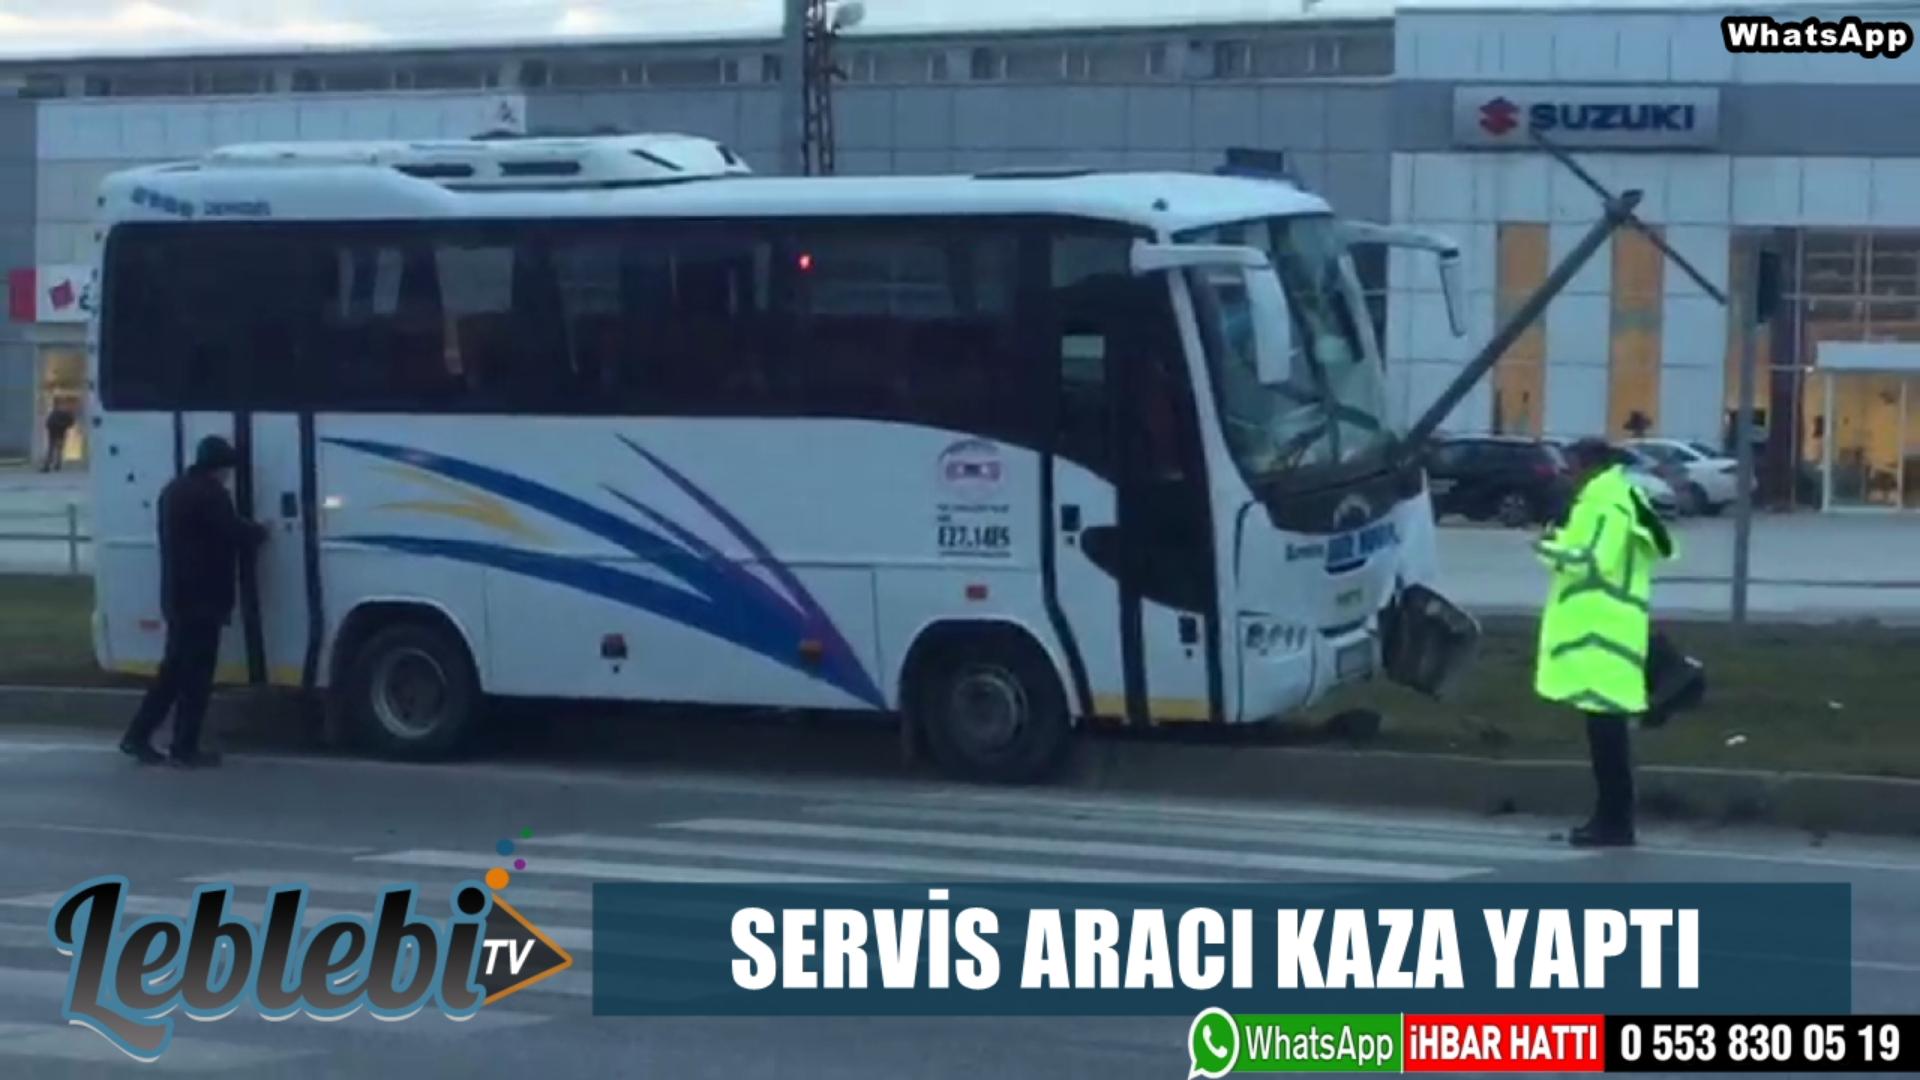 SERVİS ARACI KAZA YAPTI